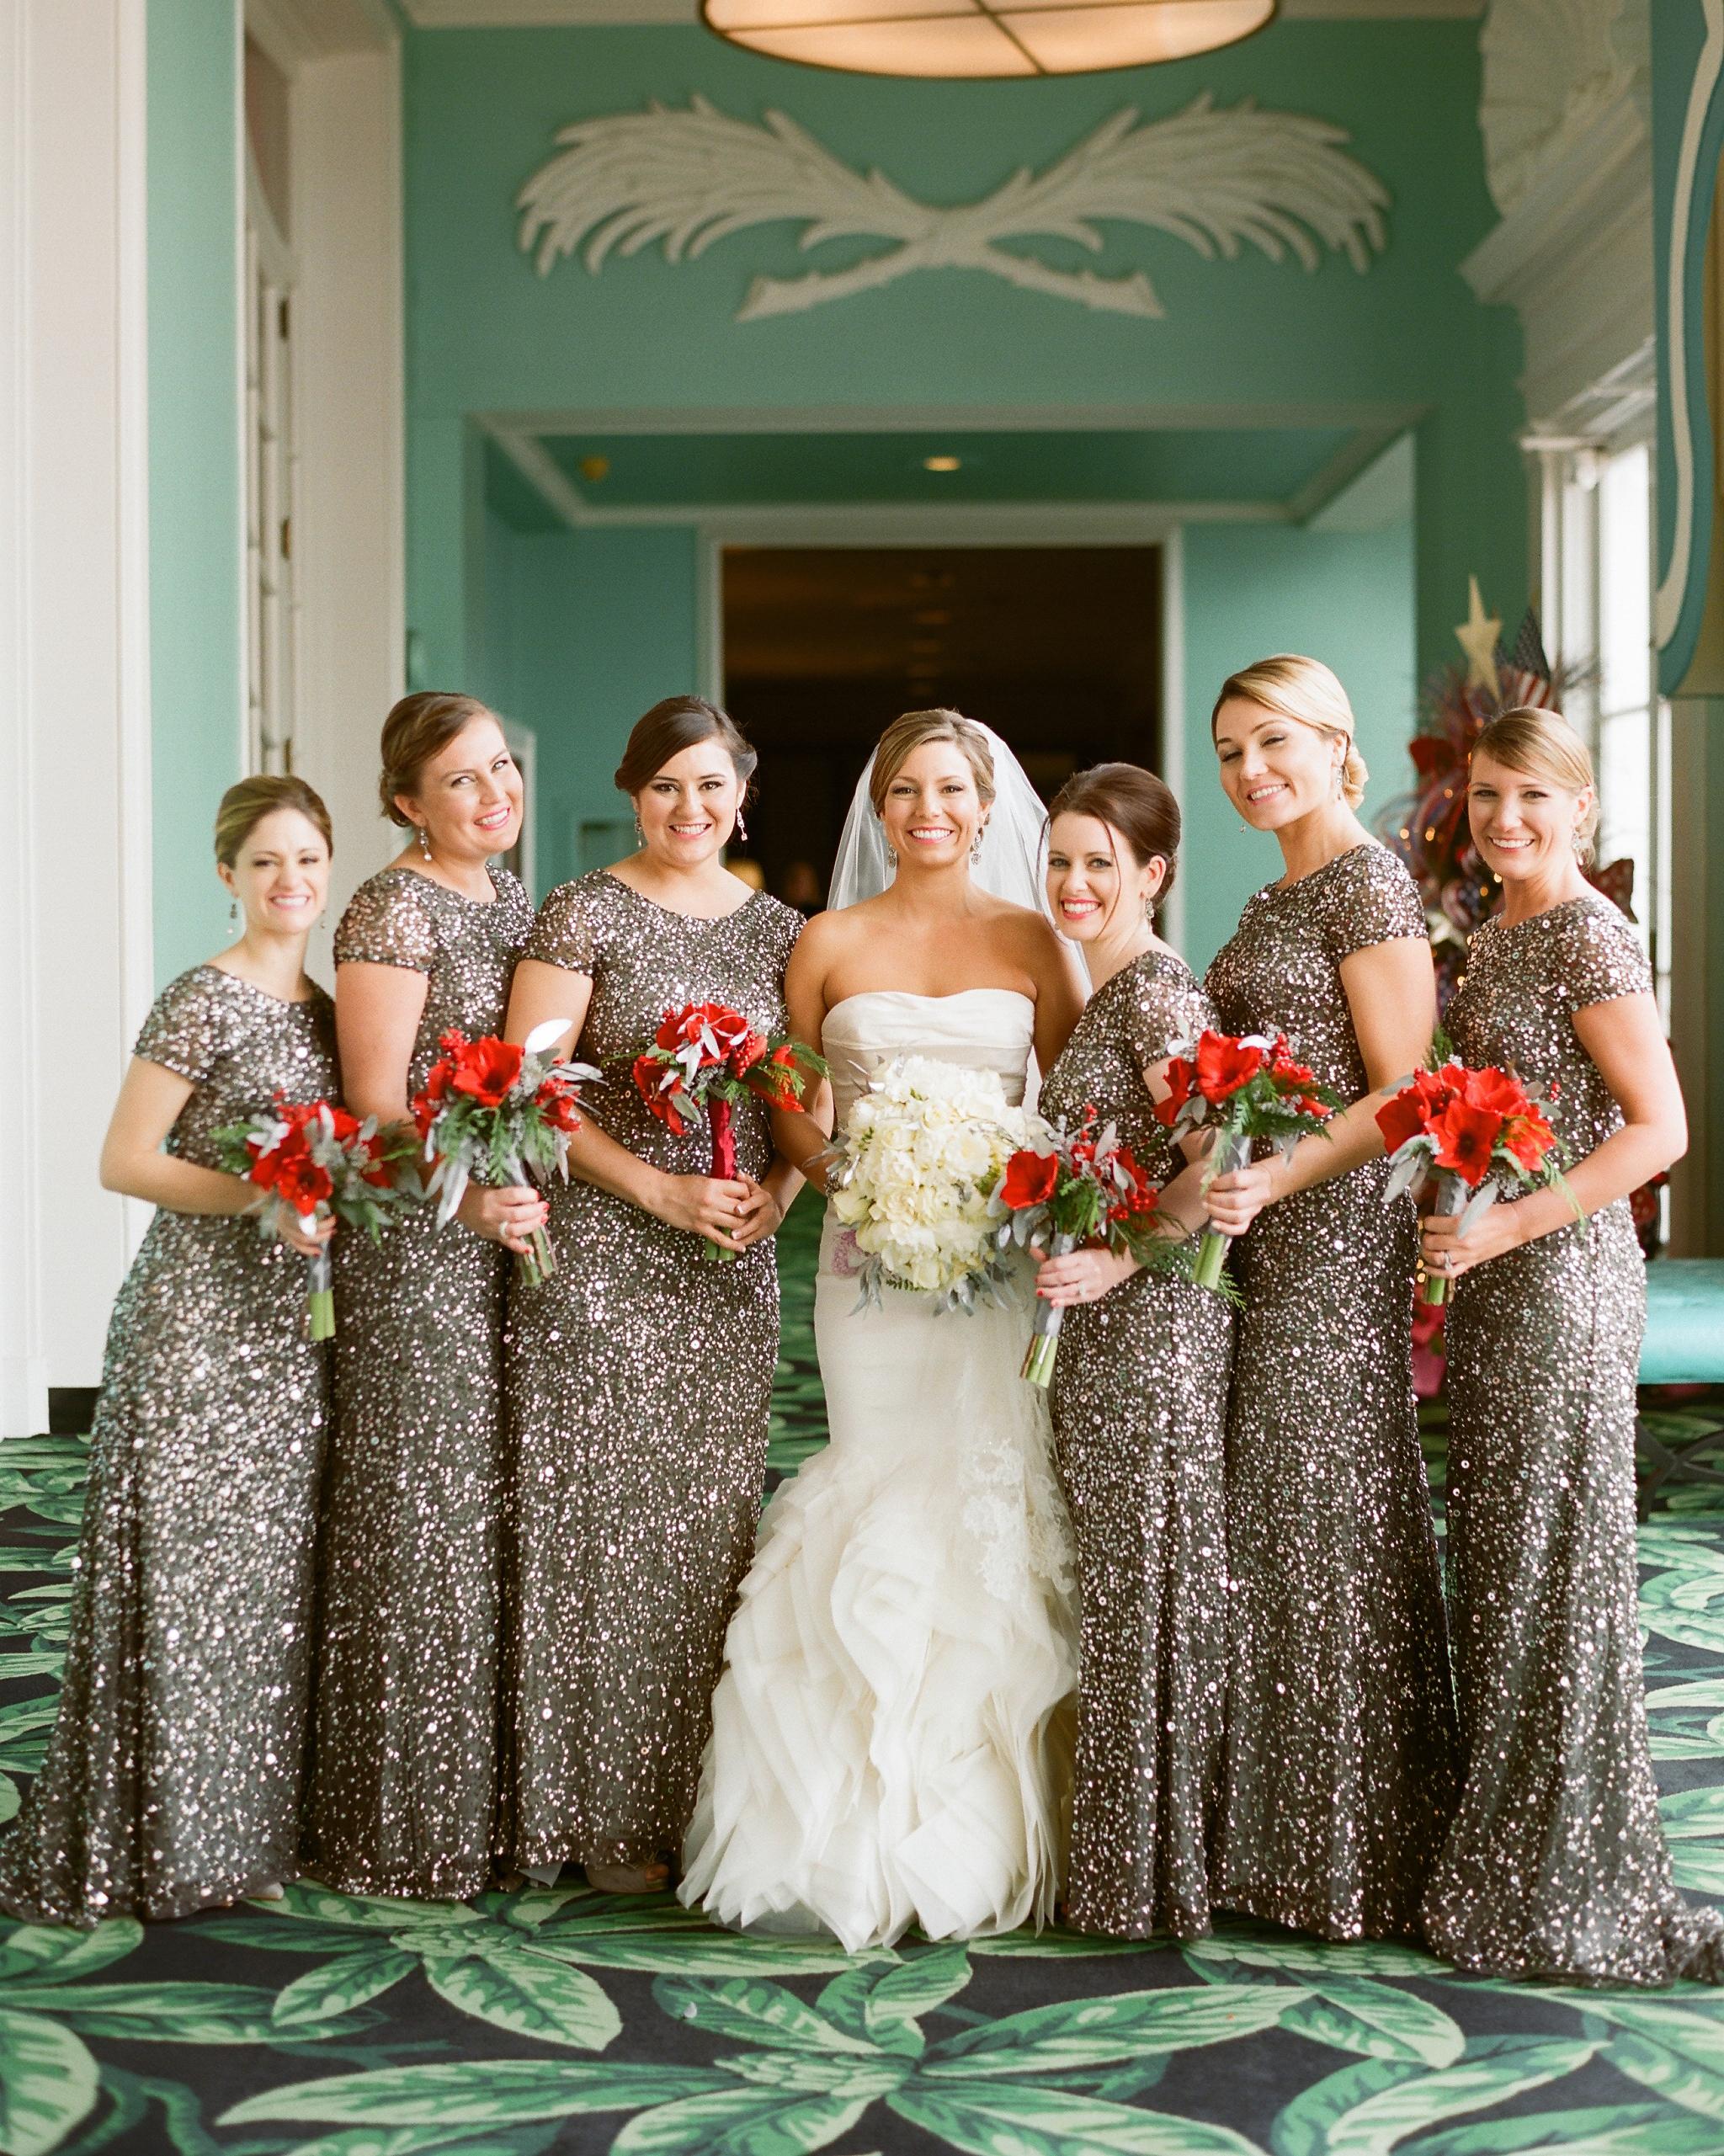 paige-michael-wedding-bridesmaids-0498-s112431-1215.jpg